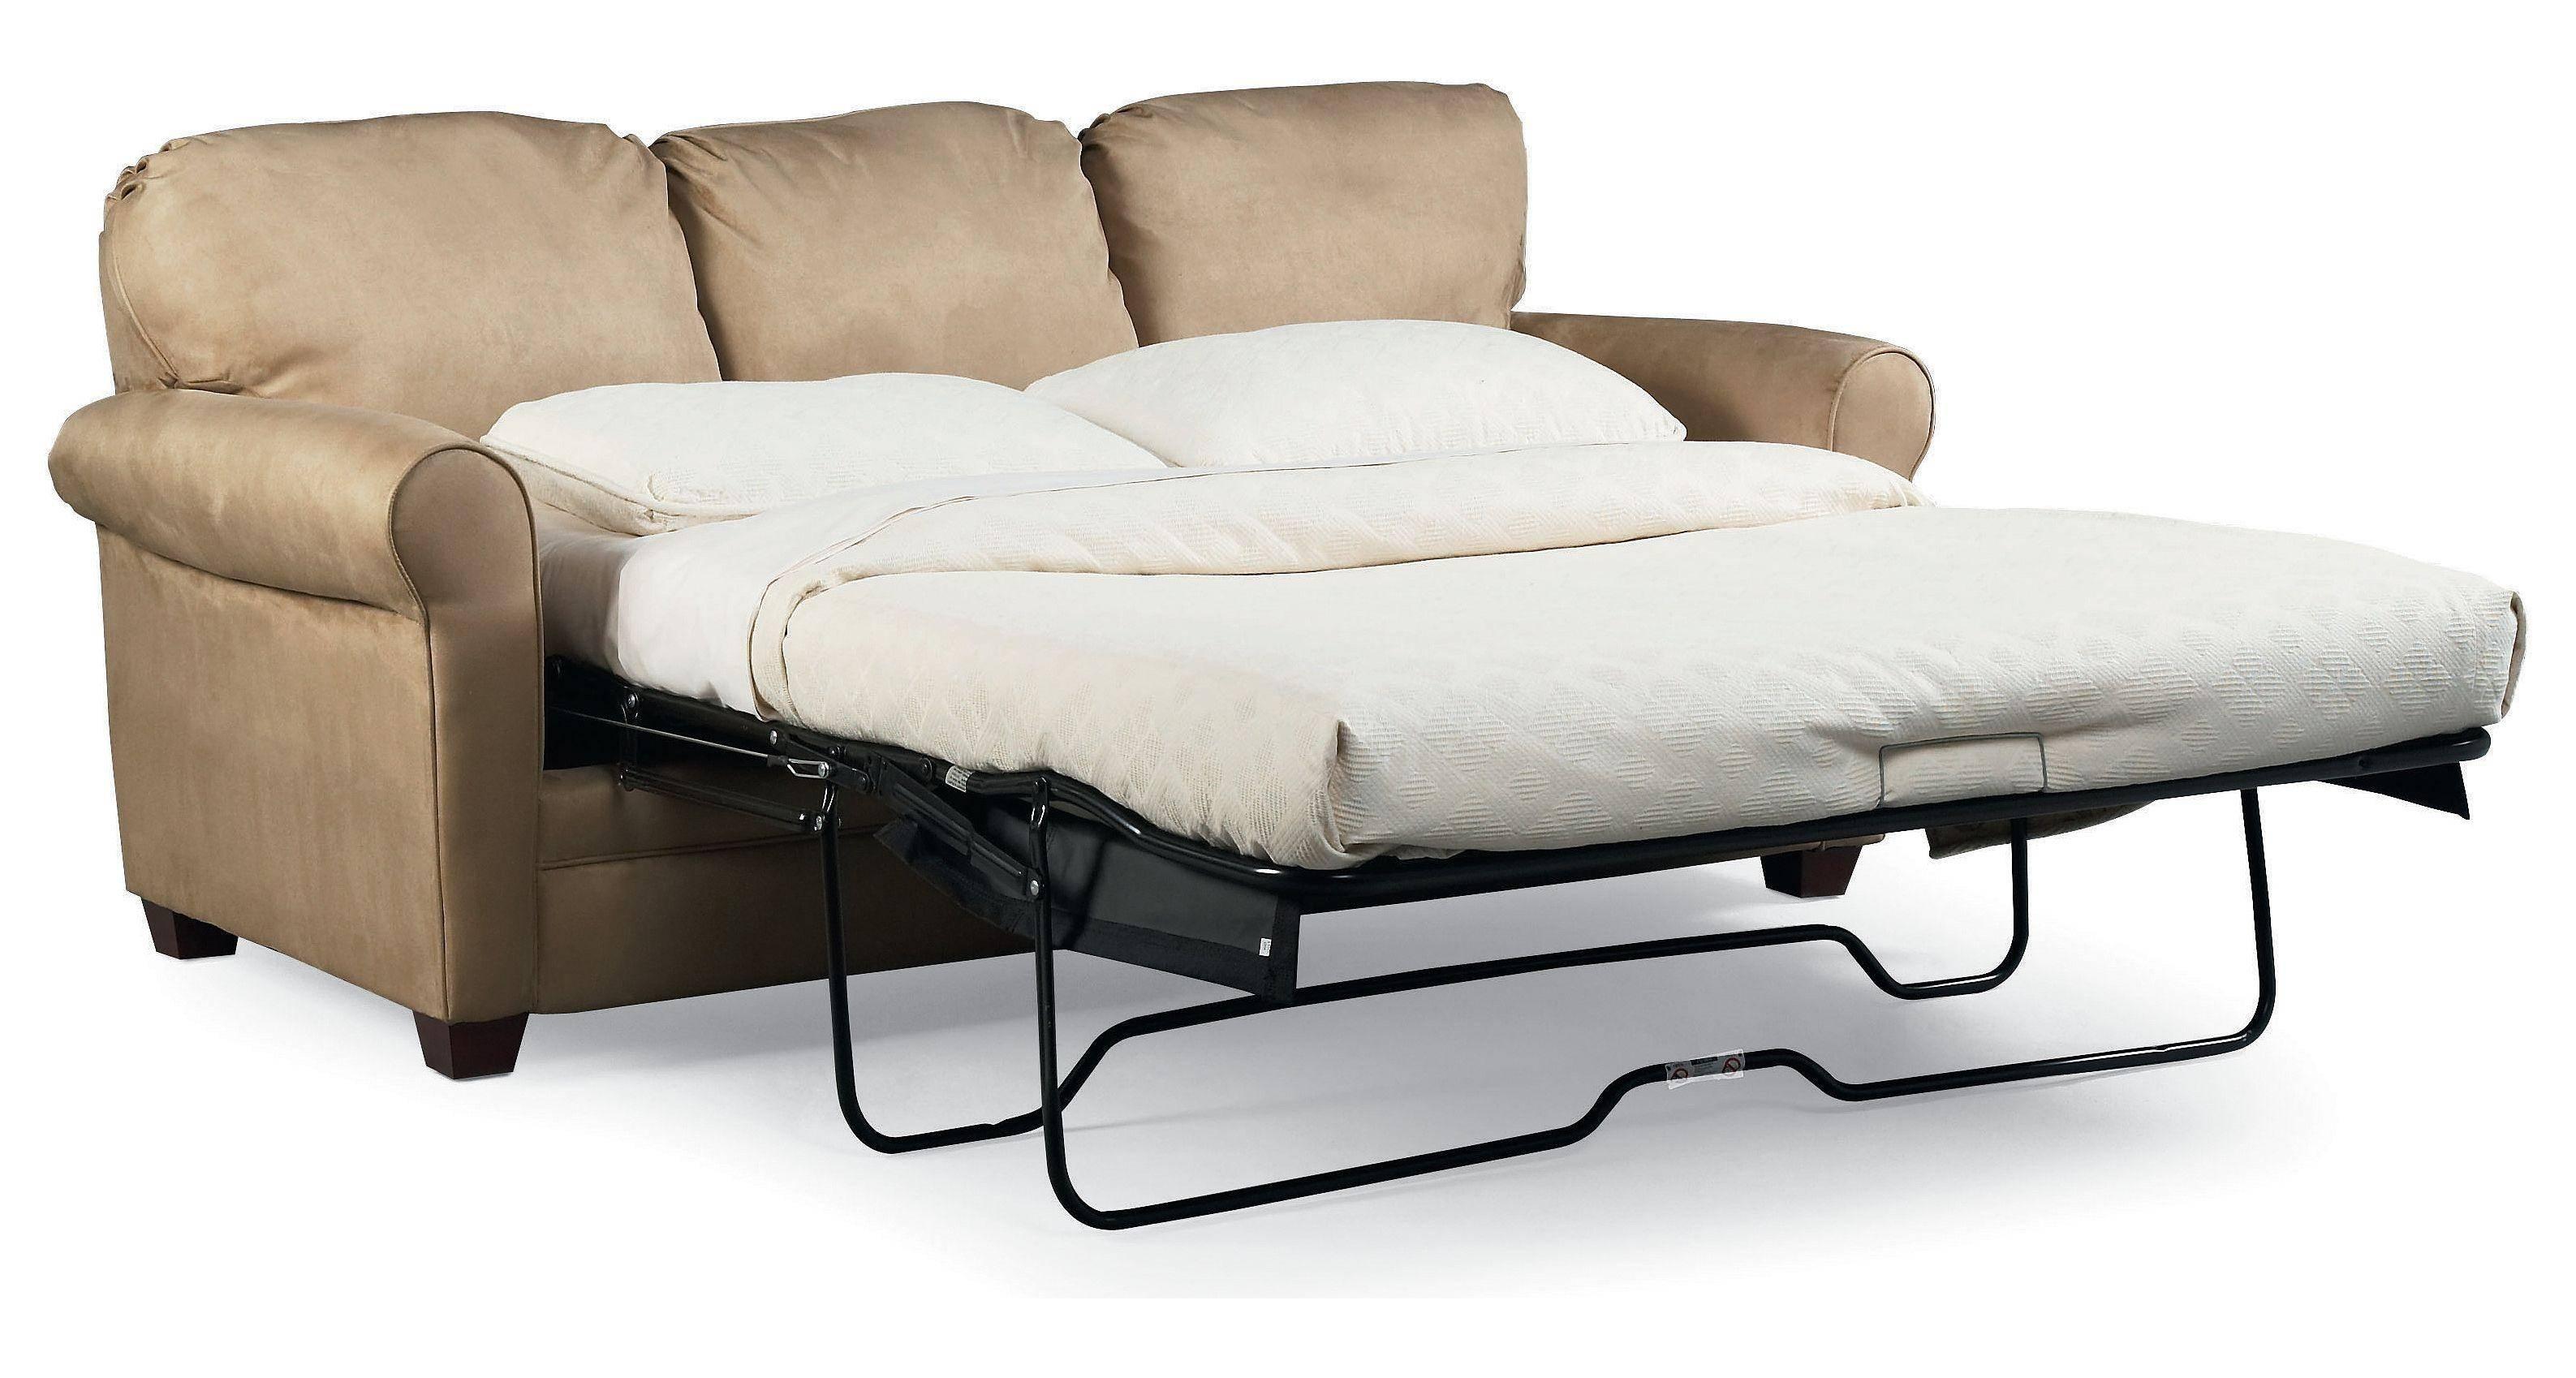 20 Top Craigslist Sleeper Sofas | Sofa Ideas For Craigslist Sleeper Sofas (View 1 of 15)